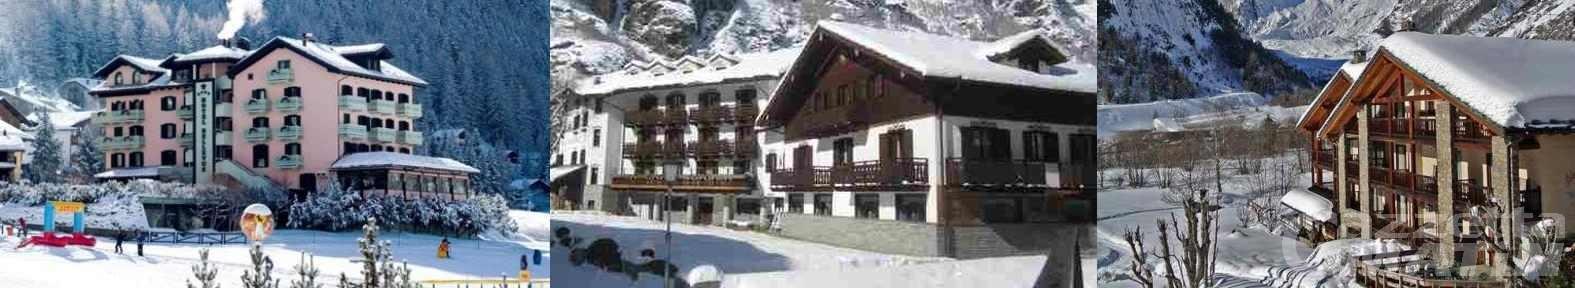 Turismo: tre alberghi valdostani tra i TOP TripAdvisor